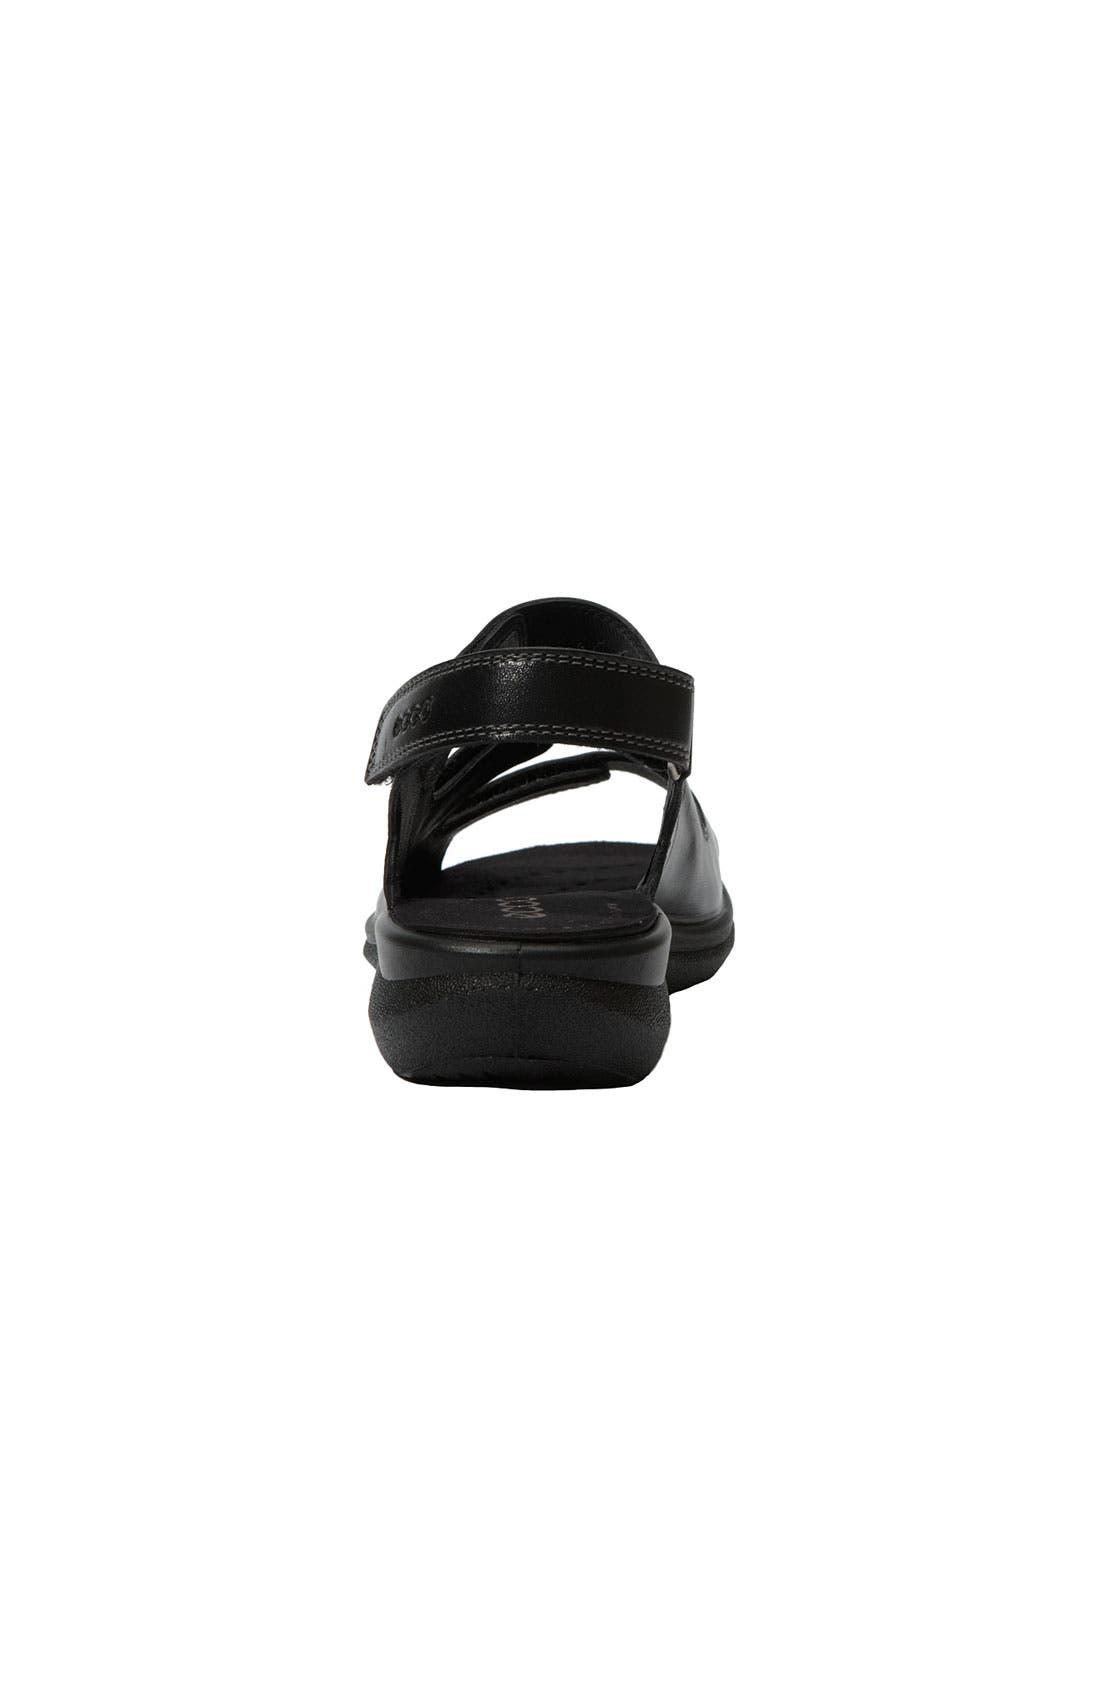 'Breeze' Sandal,                             Alternate thumbnail 4, color,                             001